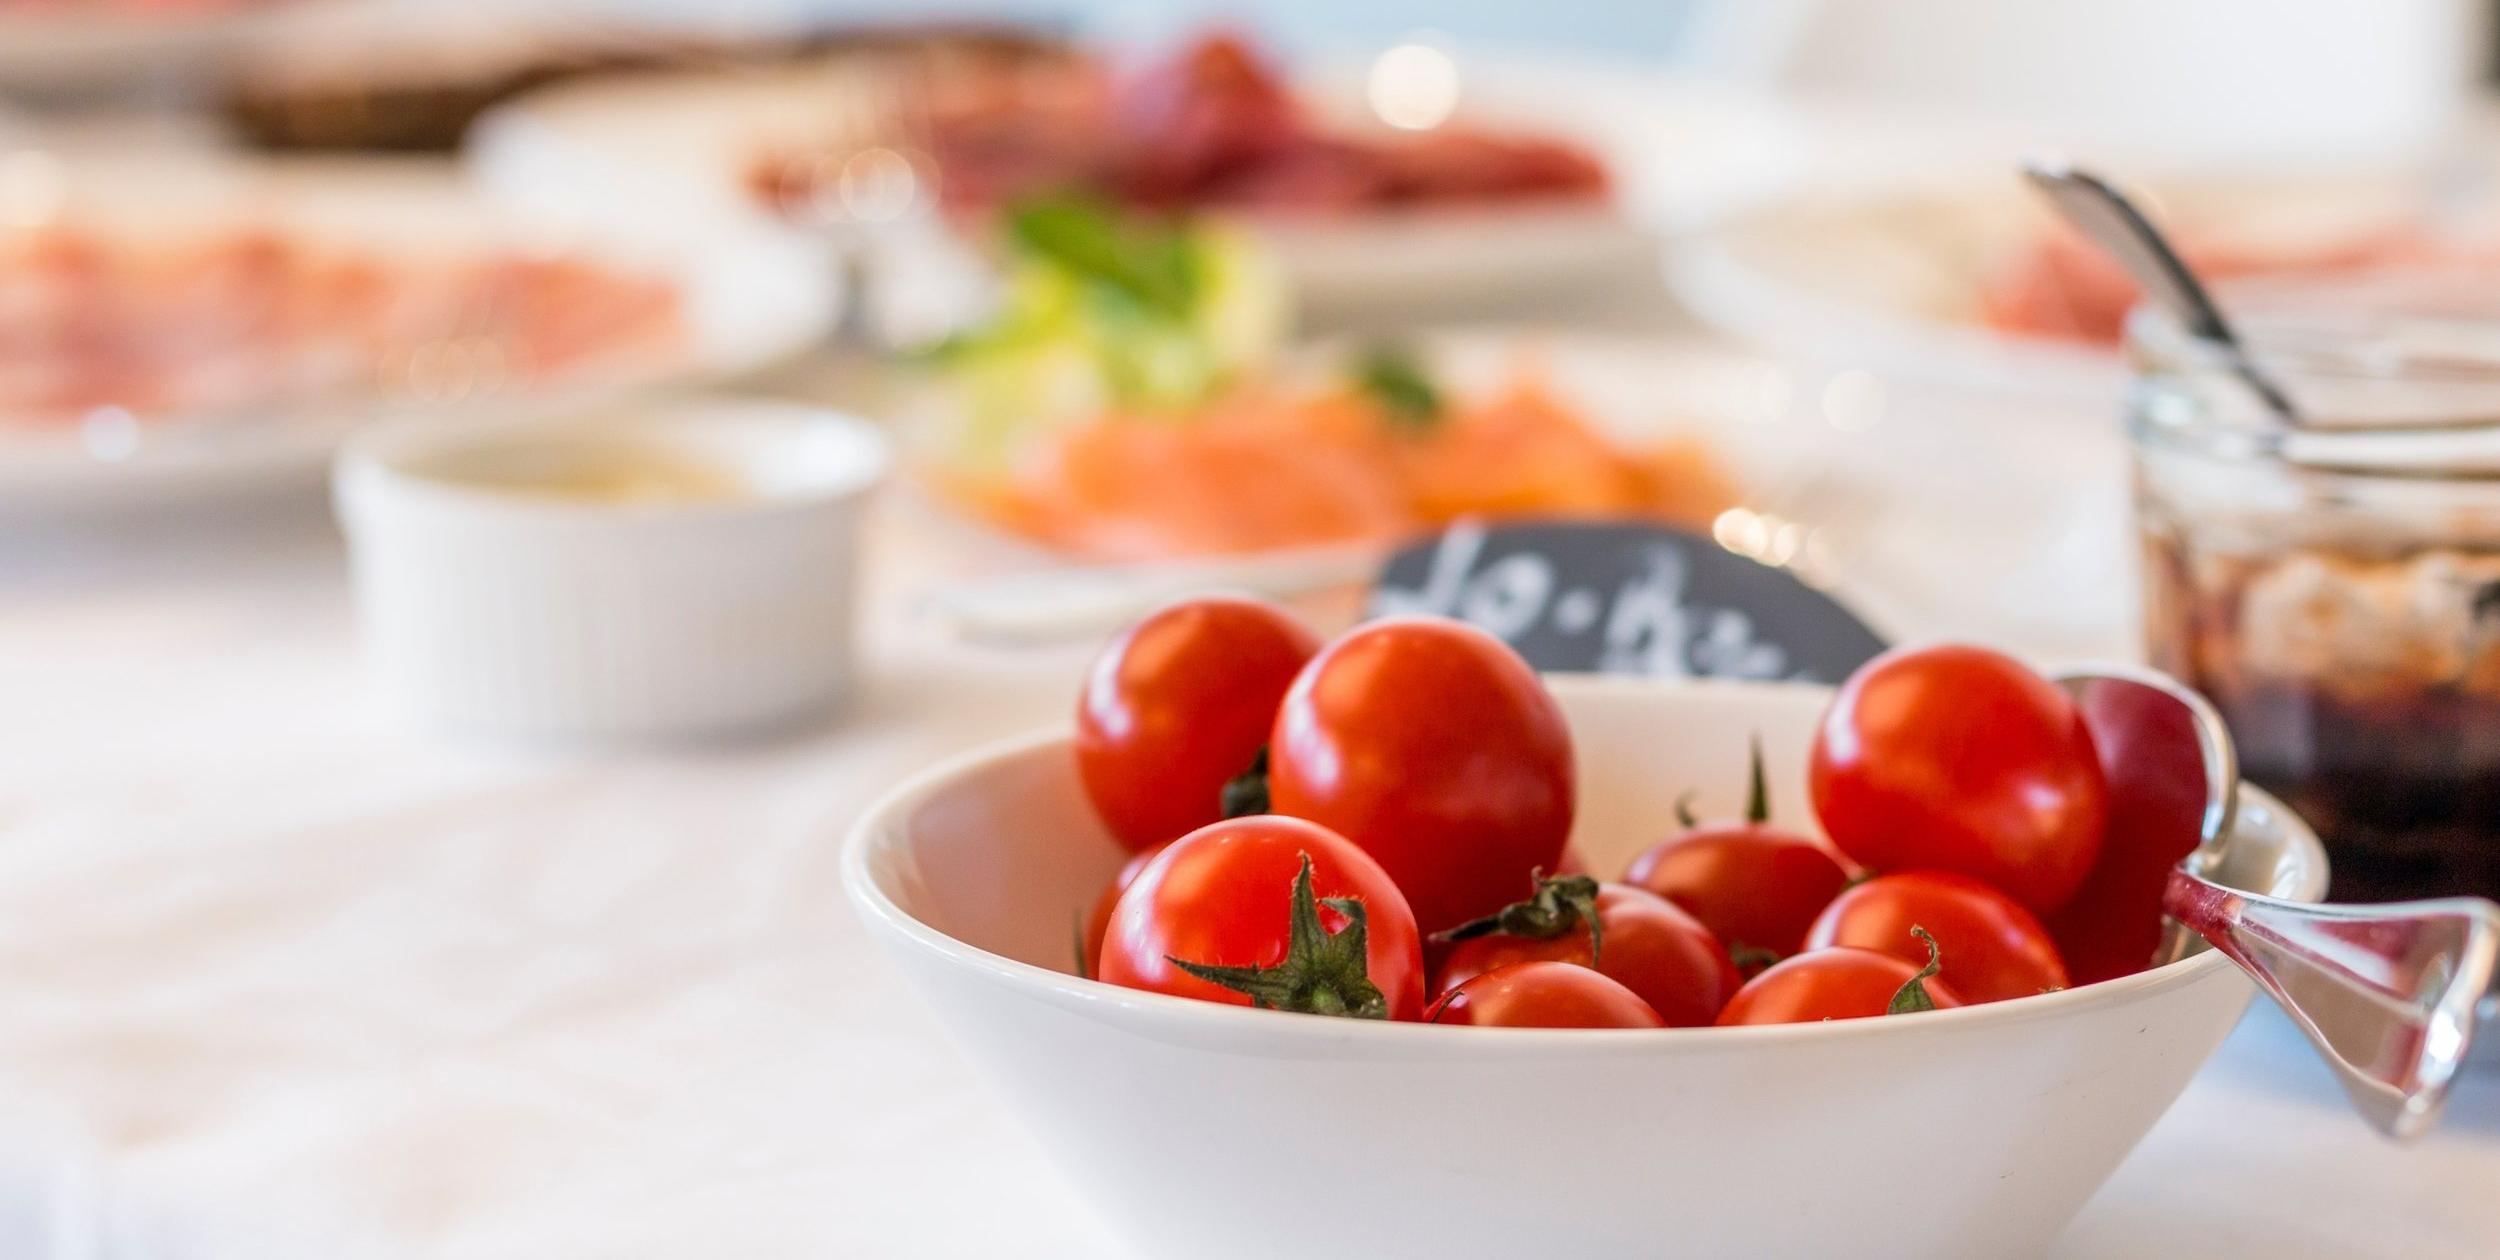 Pantry Assessment - Eat Well. Feel Well.